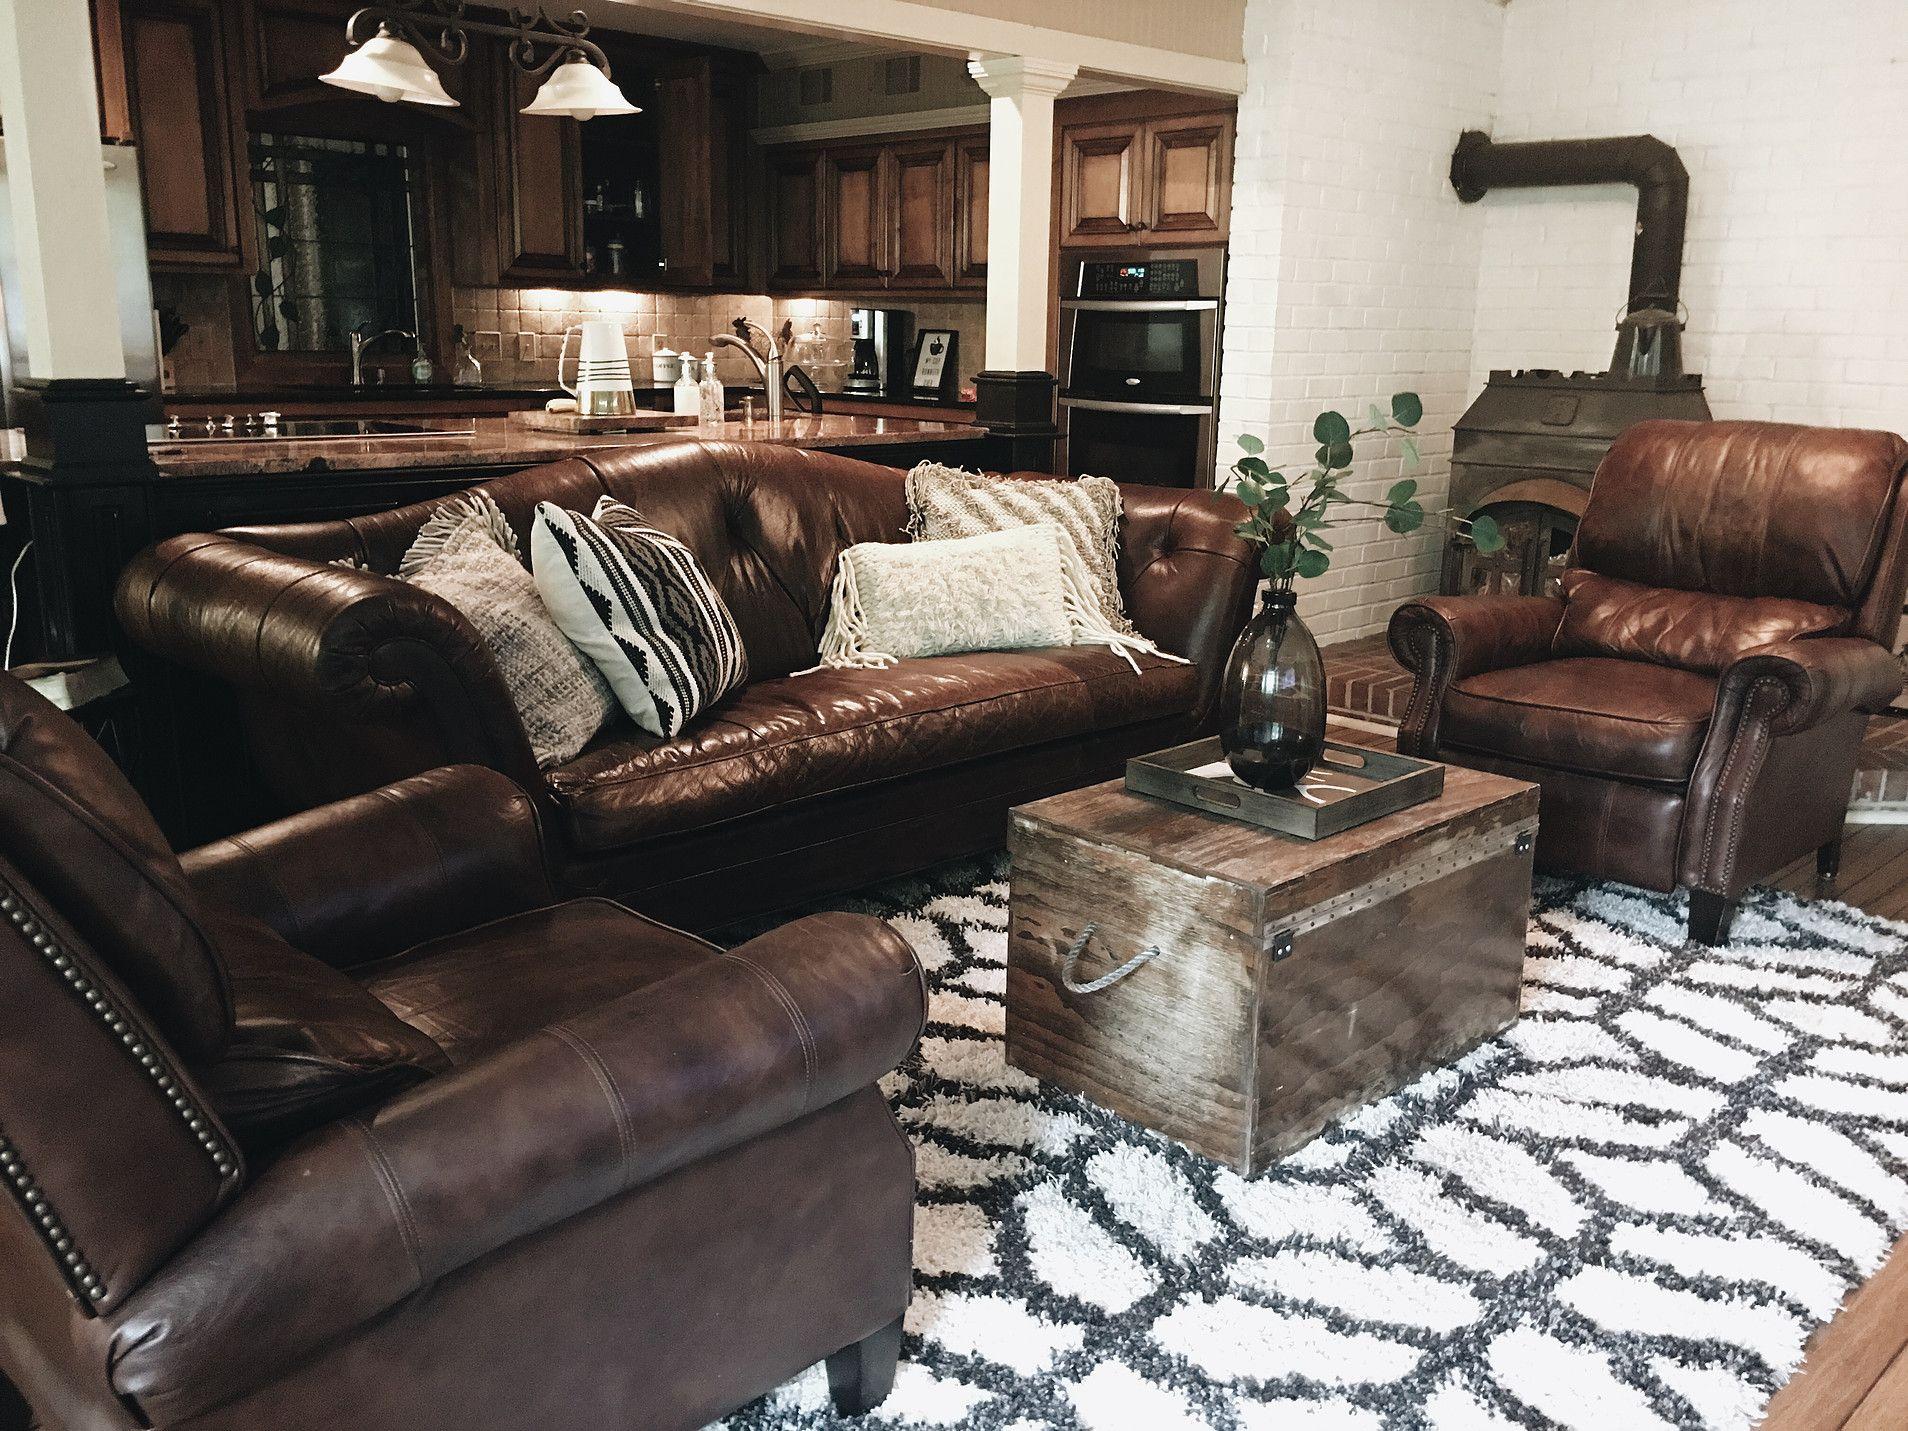 HOW TO FURNISH YOUR HOME CHEAP | Morgancastleblog